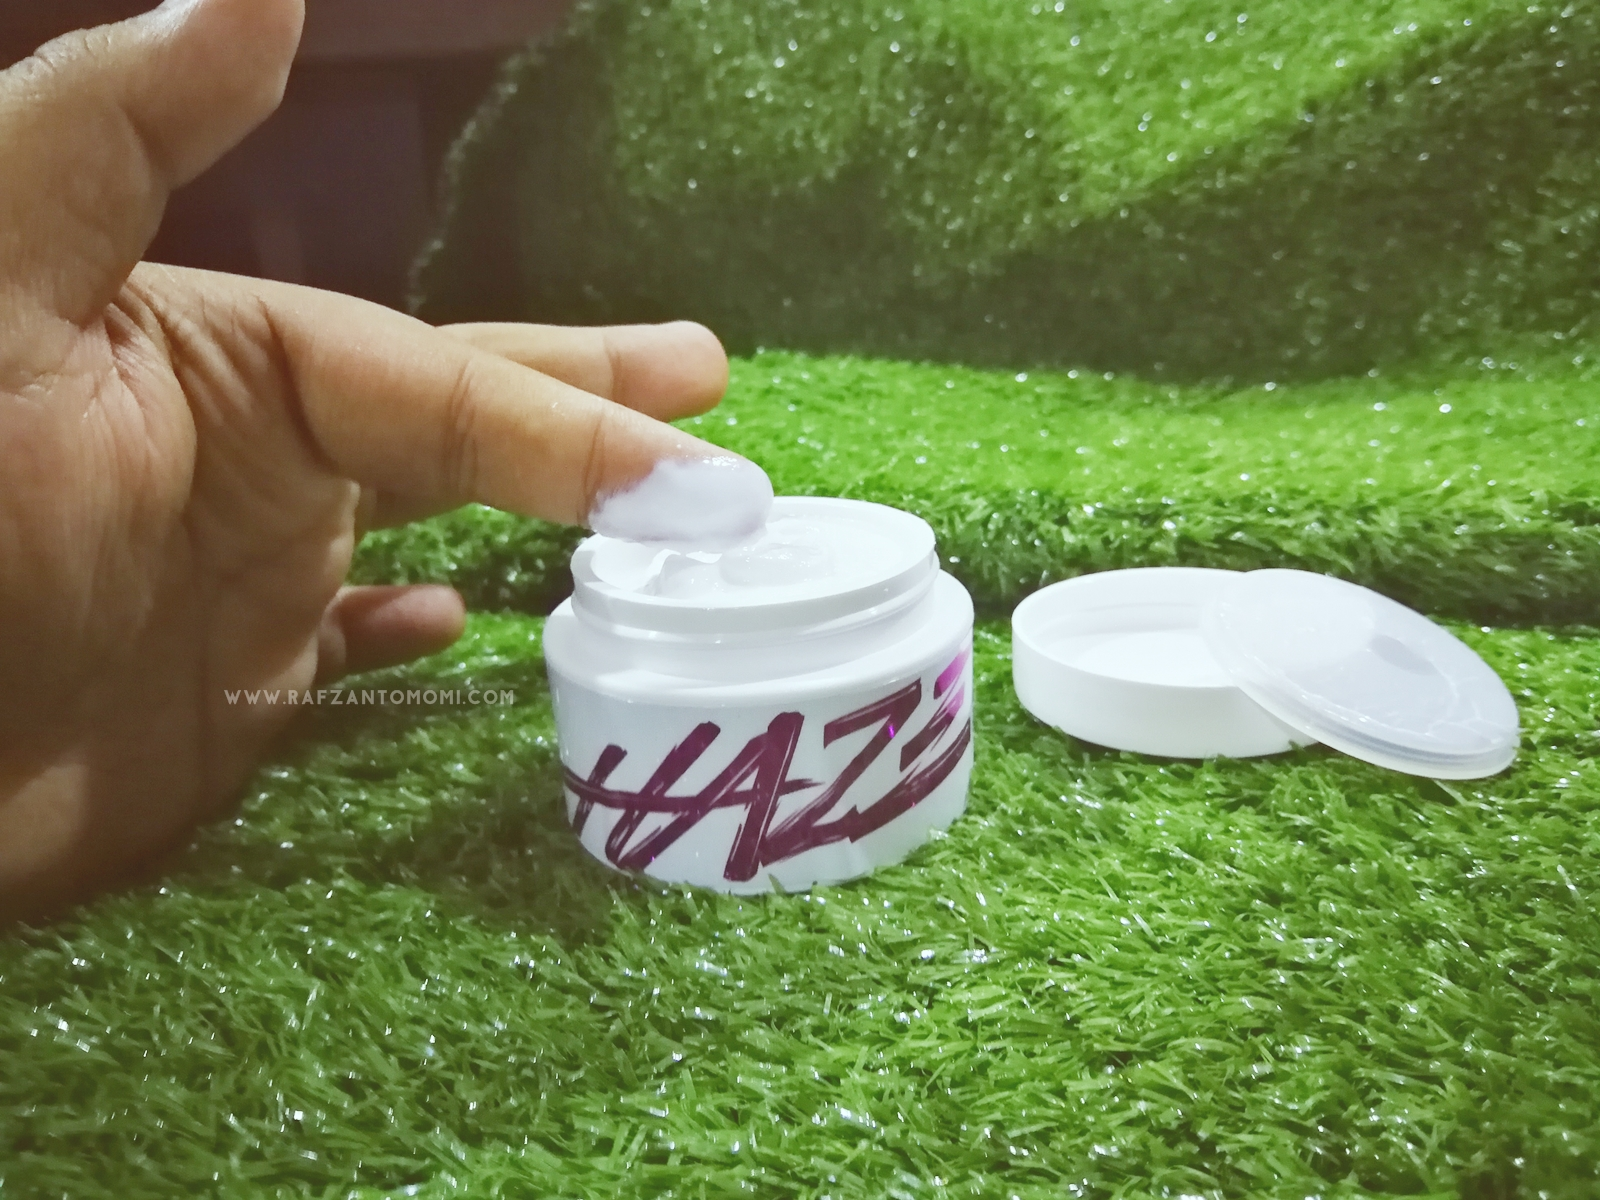 Haze Moisturizer - Membantu Mencerah, Melembap & Melindungi Kulit Anda !